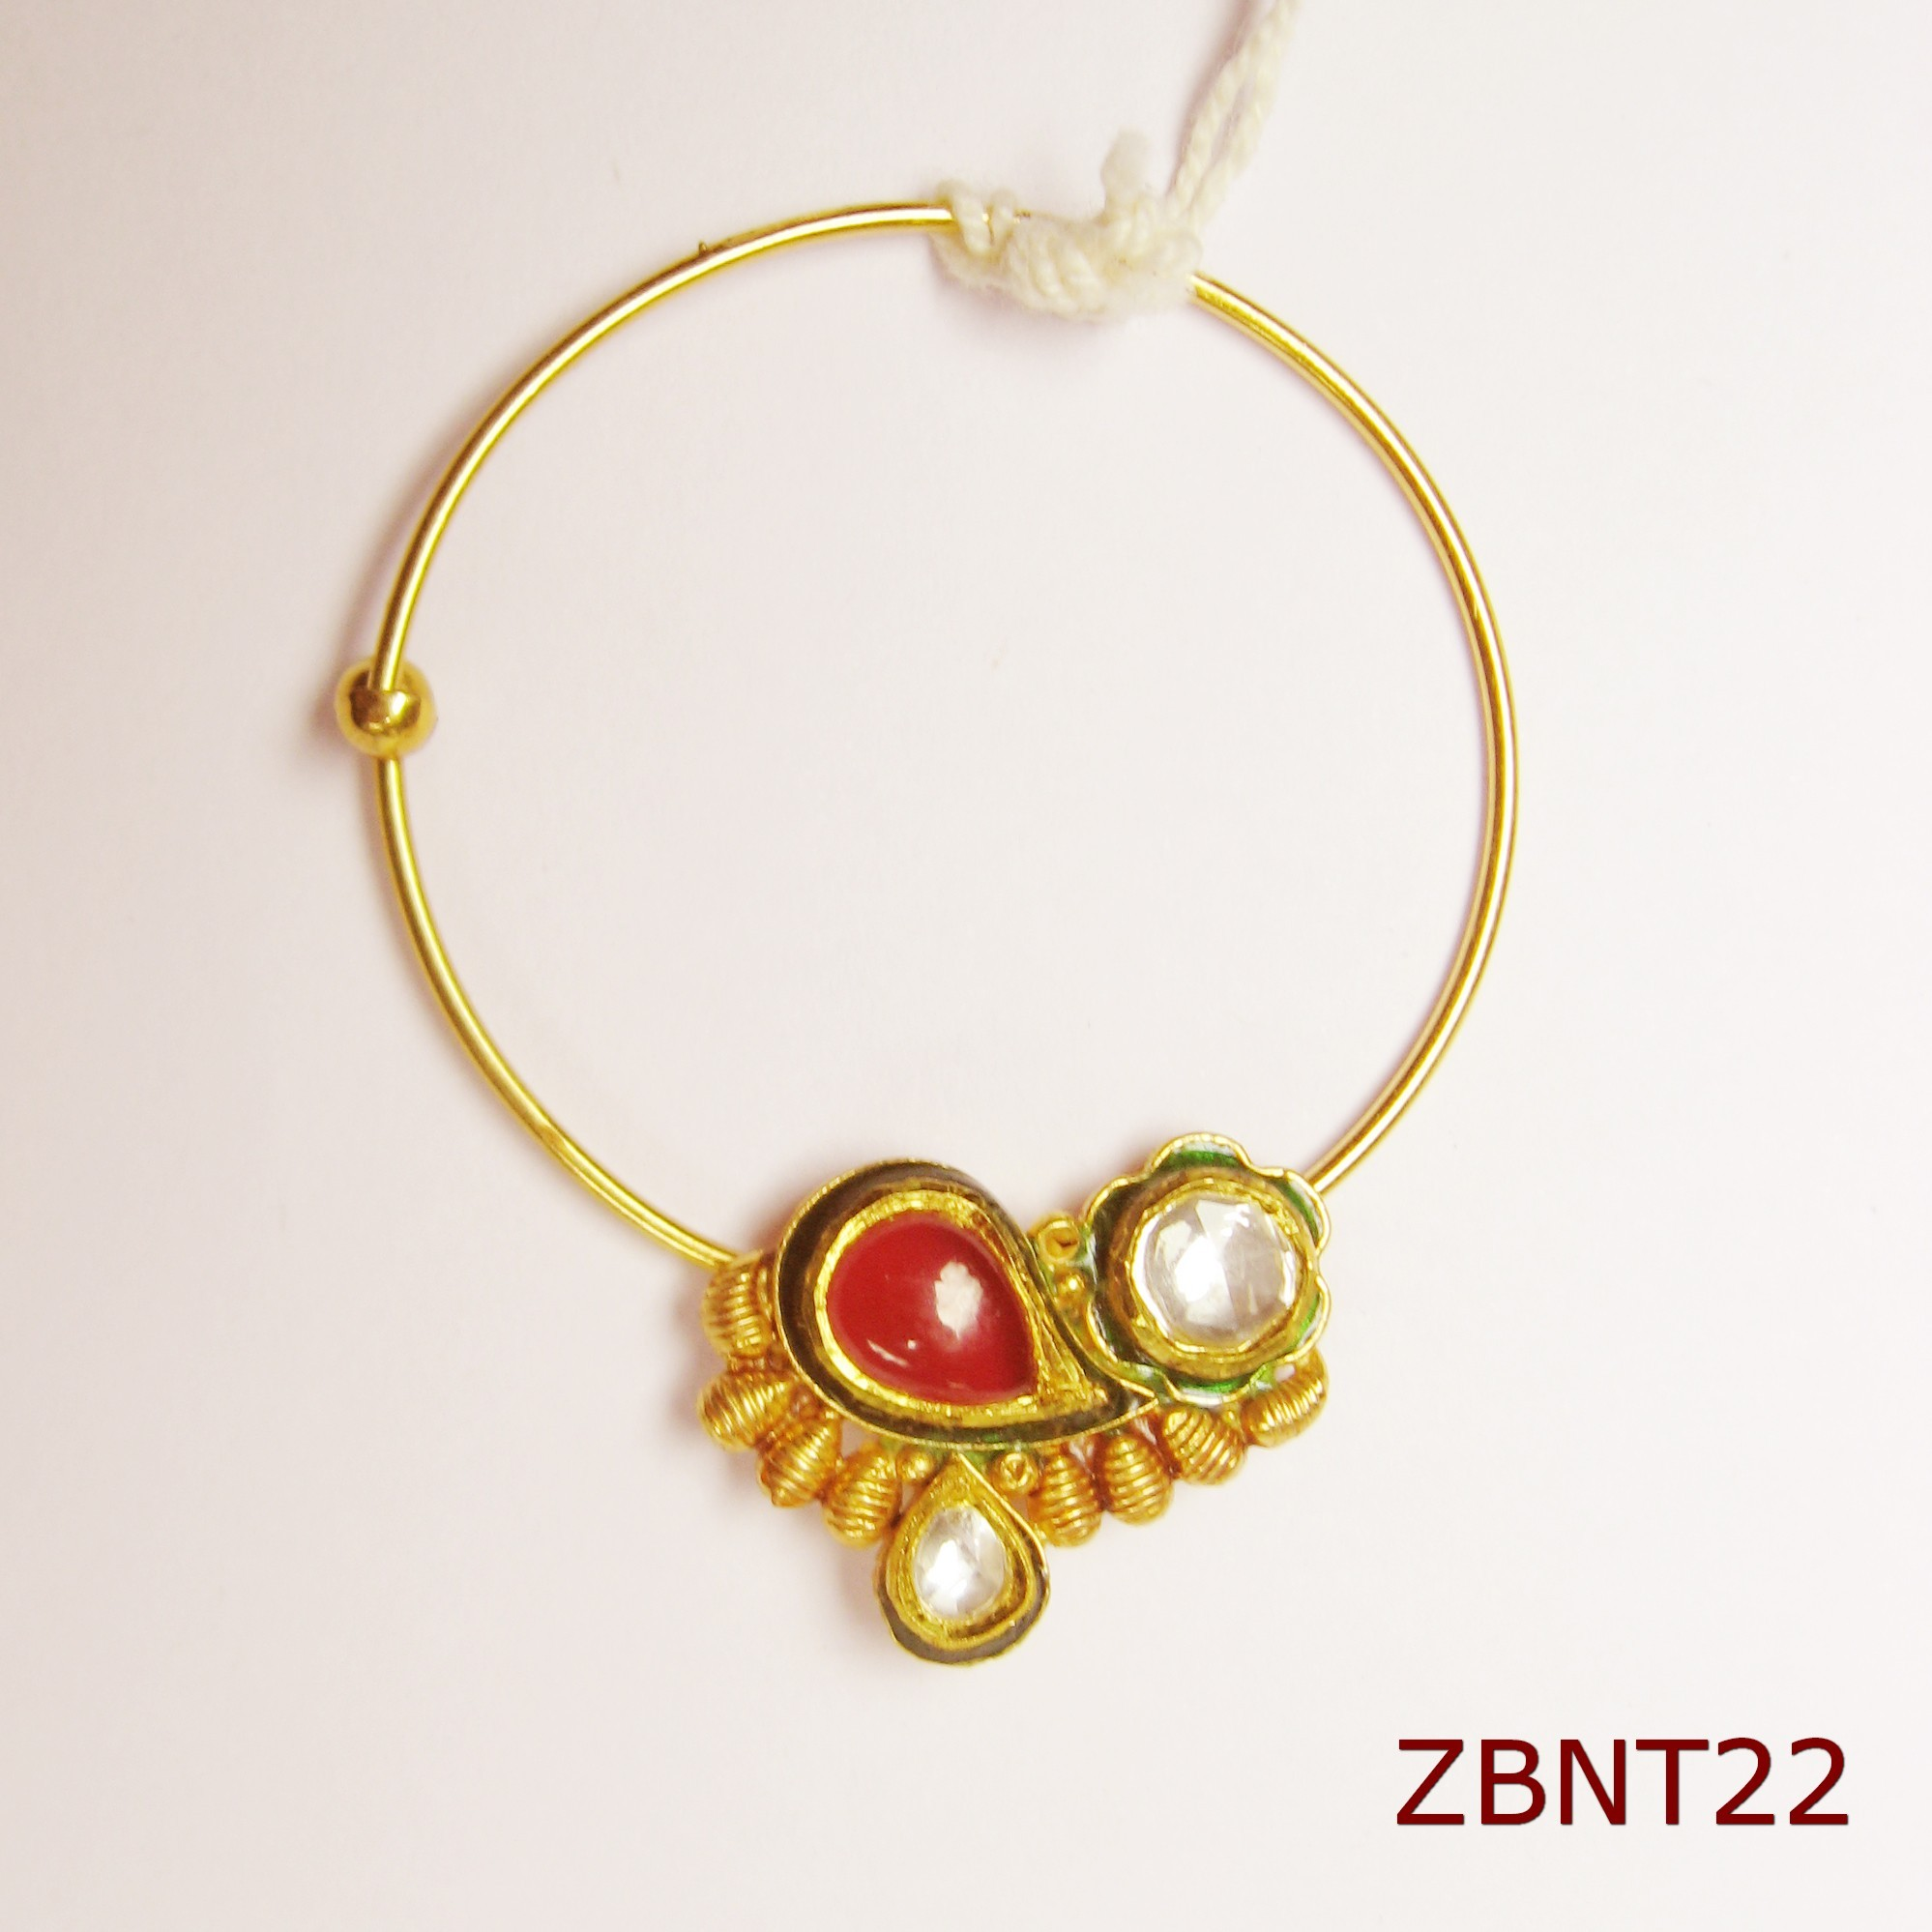 ZBNT22